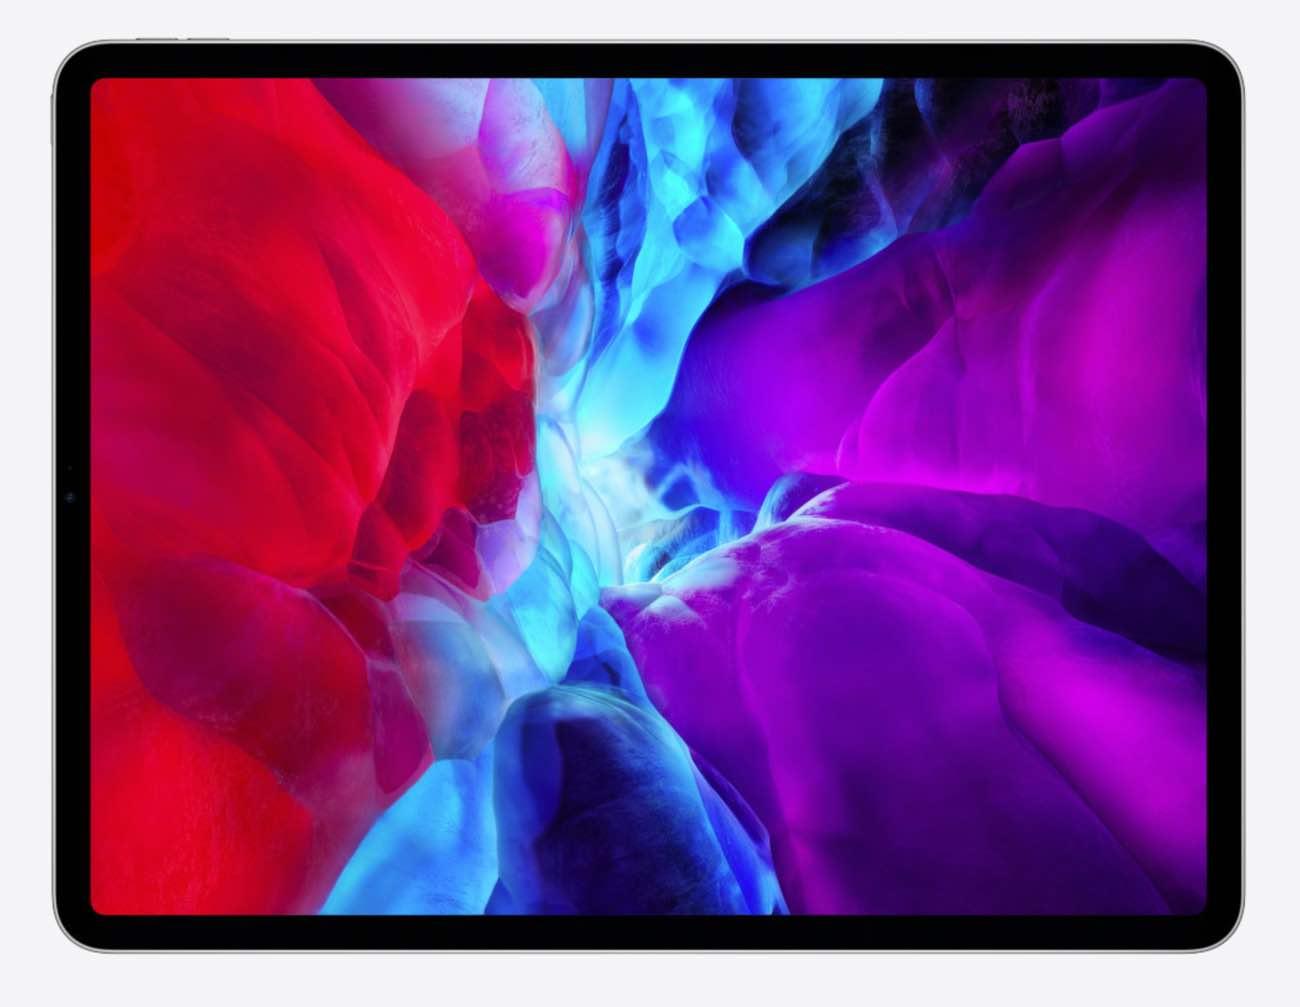 2020 iPad Pro Wallpapers